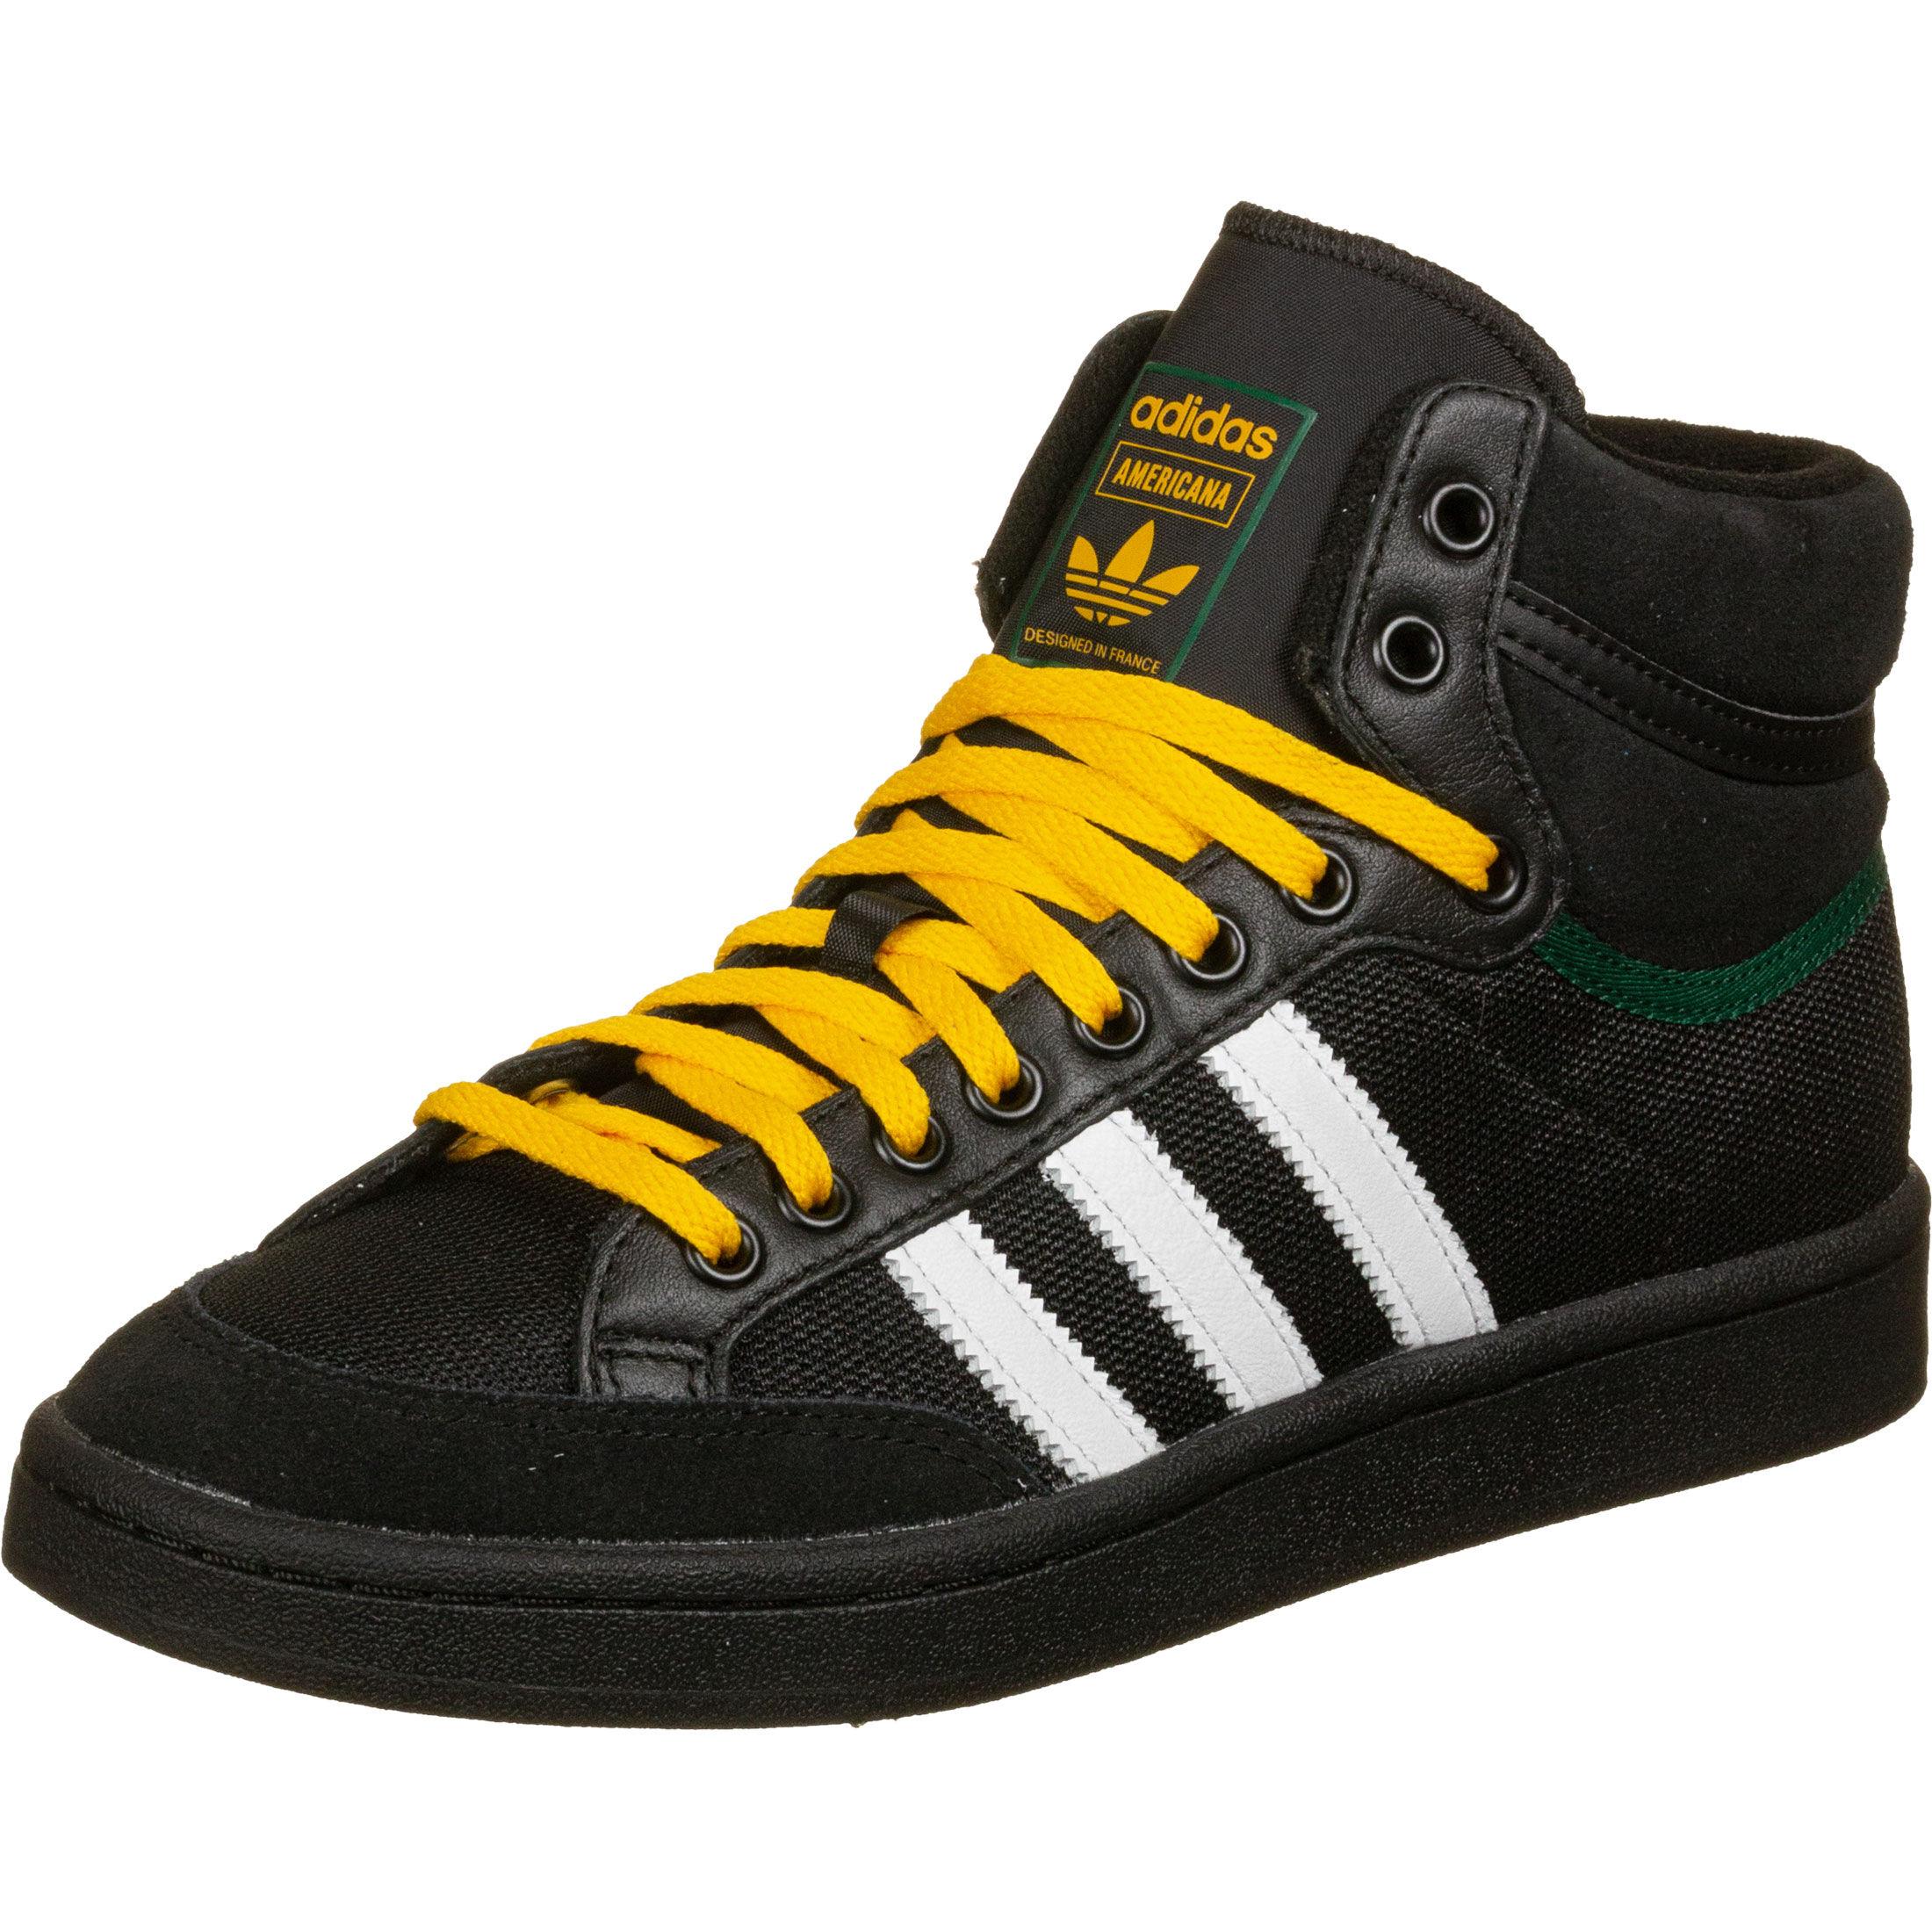 Propio Acuerdo Rubicundo  adidas Americana Hi - Sneakers Low at Stylefile